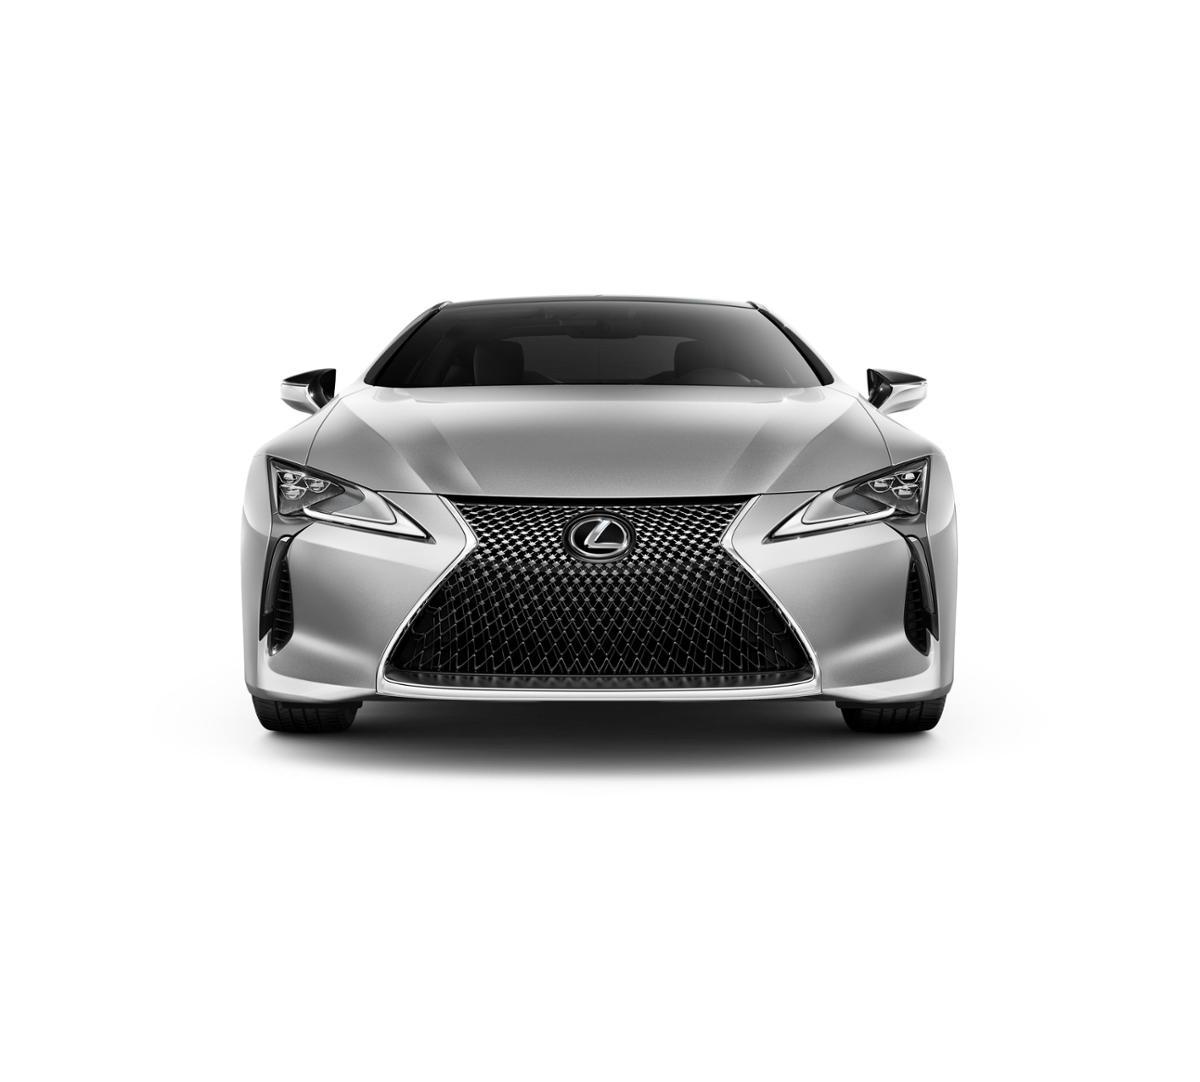 2019 Lexus LC 500 For Sale In El Cajon At Lexus El Cajon